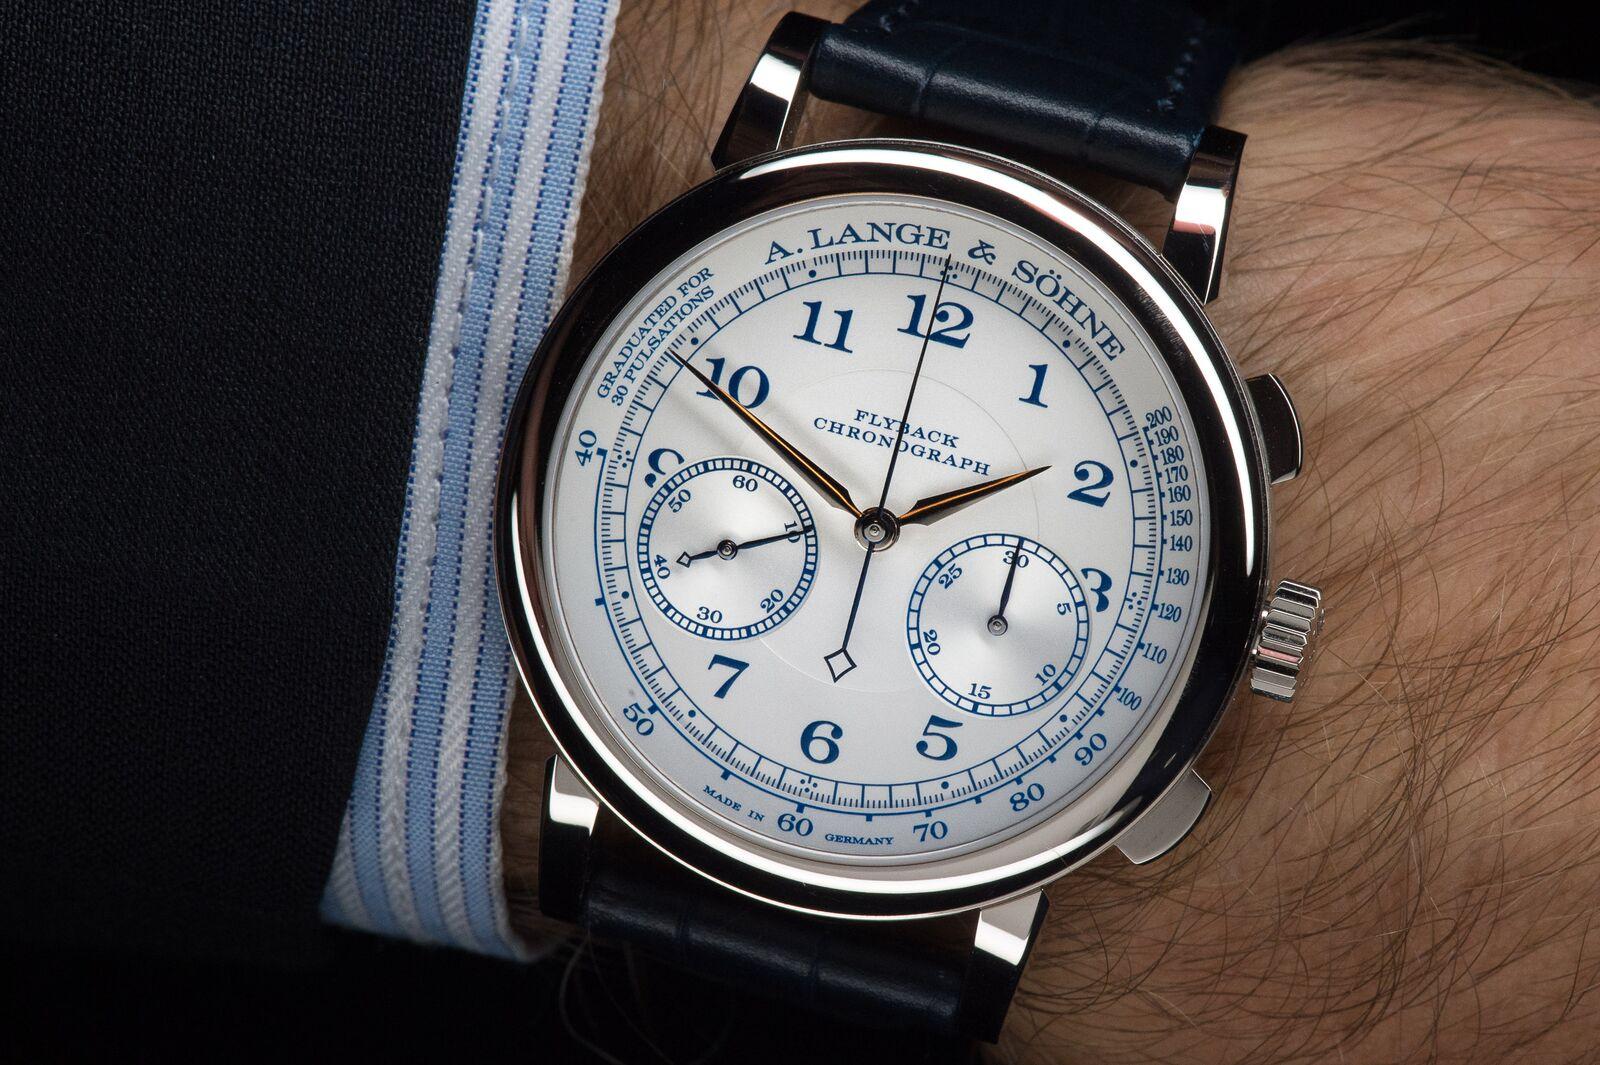 Lange Sohne 1815 Chronograph